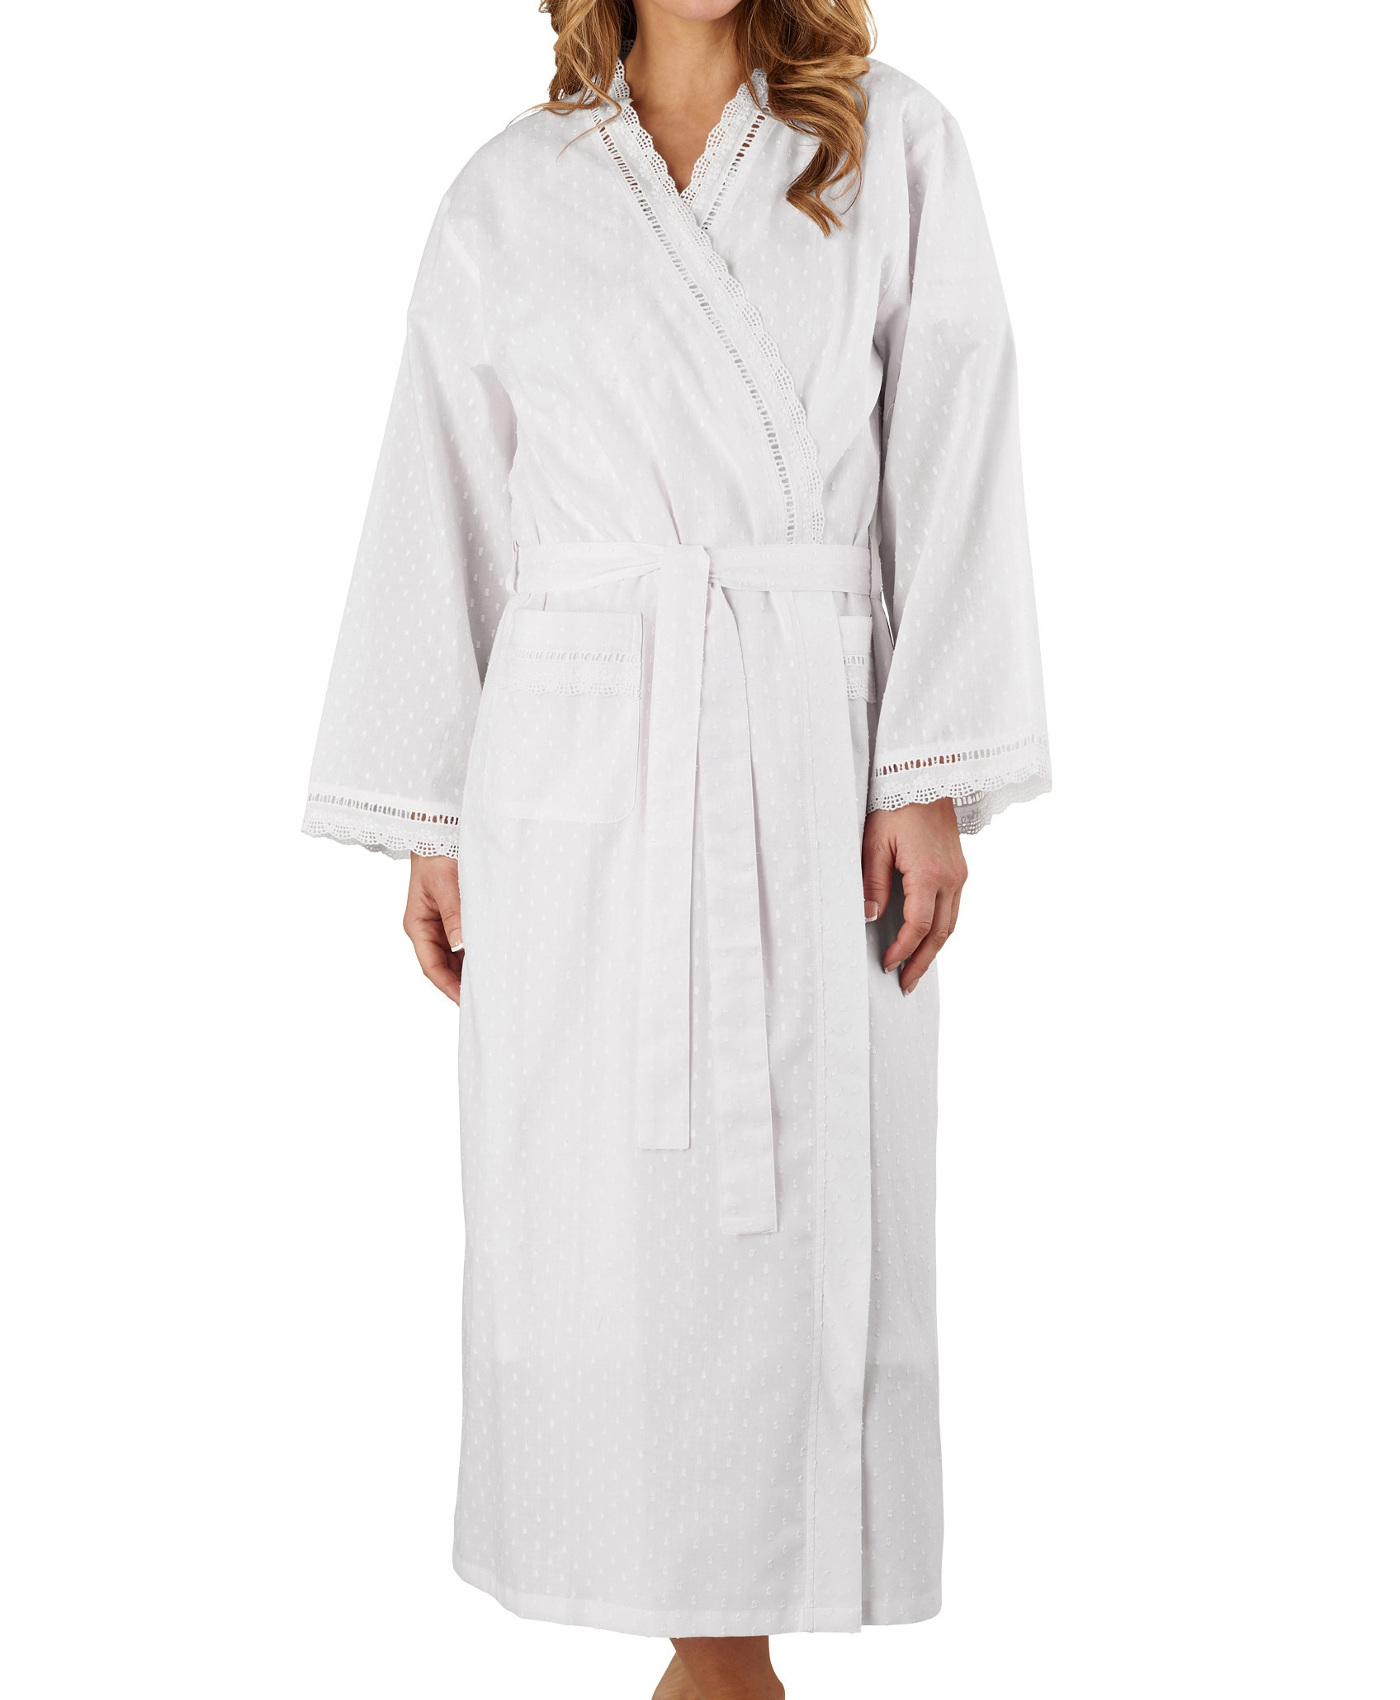 Bathrobe Womens Wrap Around Dobby Dot Robe 100% Cotton Lightweight ...